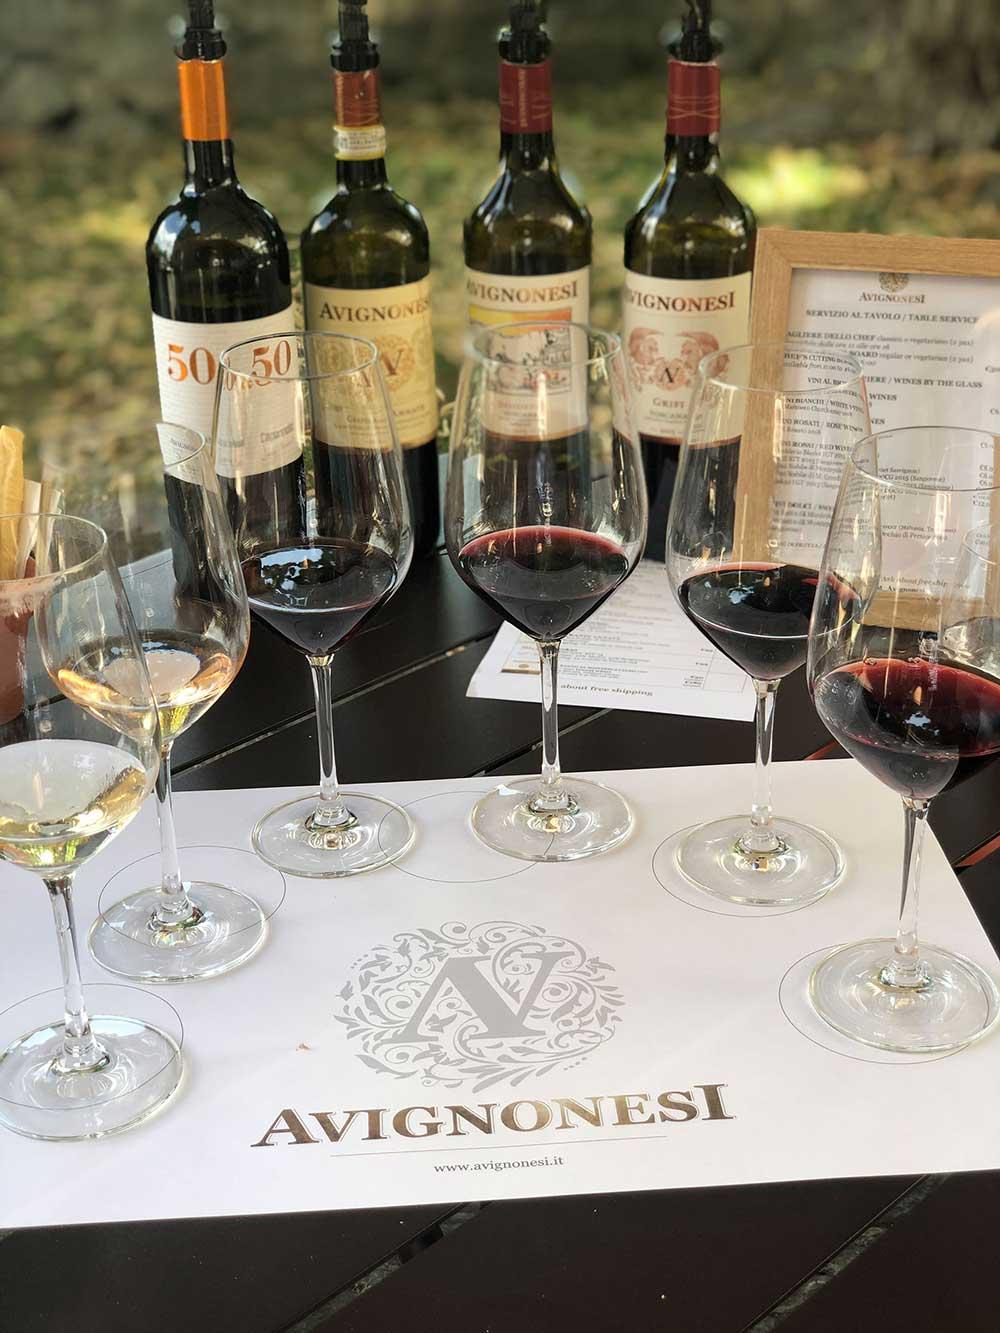 Avignonesi-winery-tasting.jpg